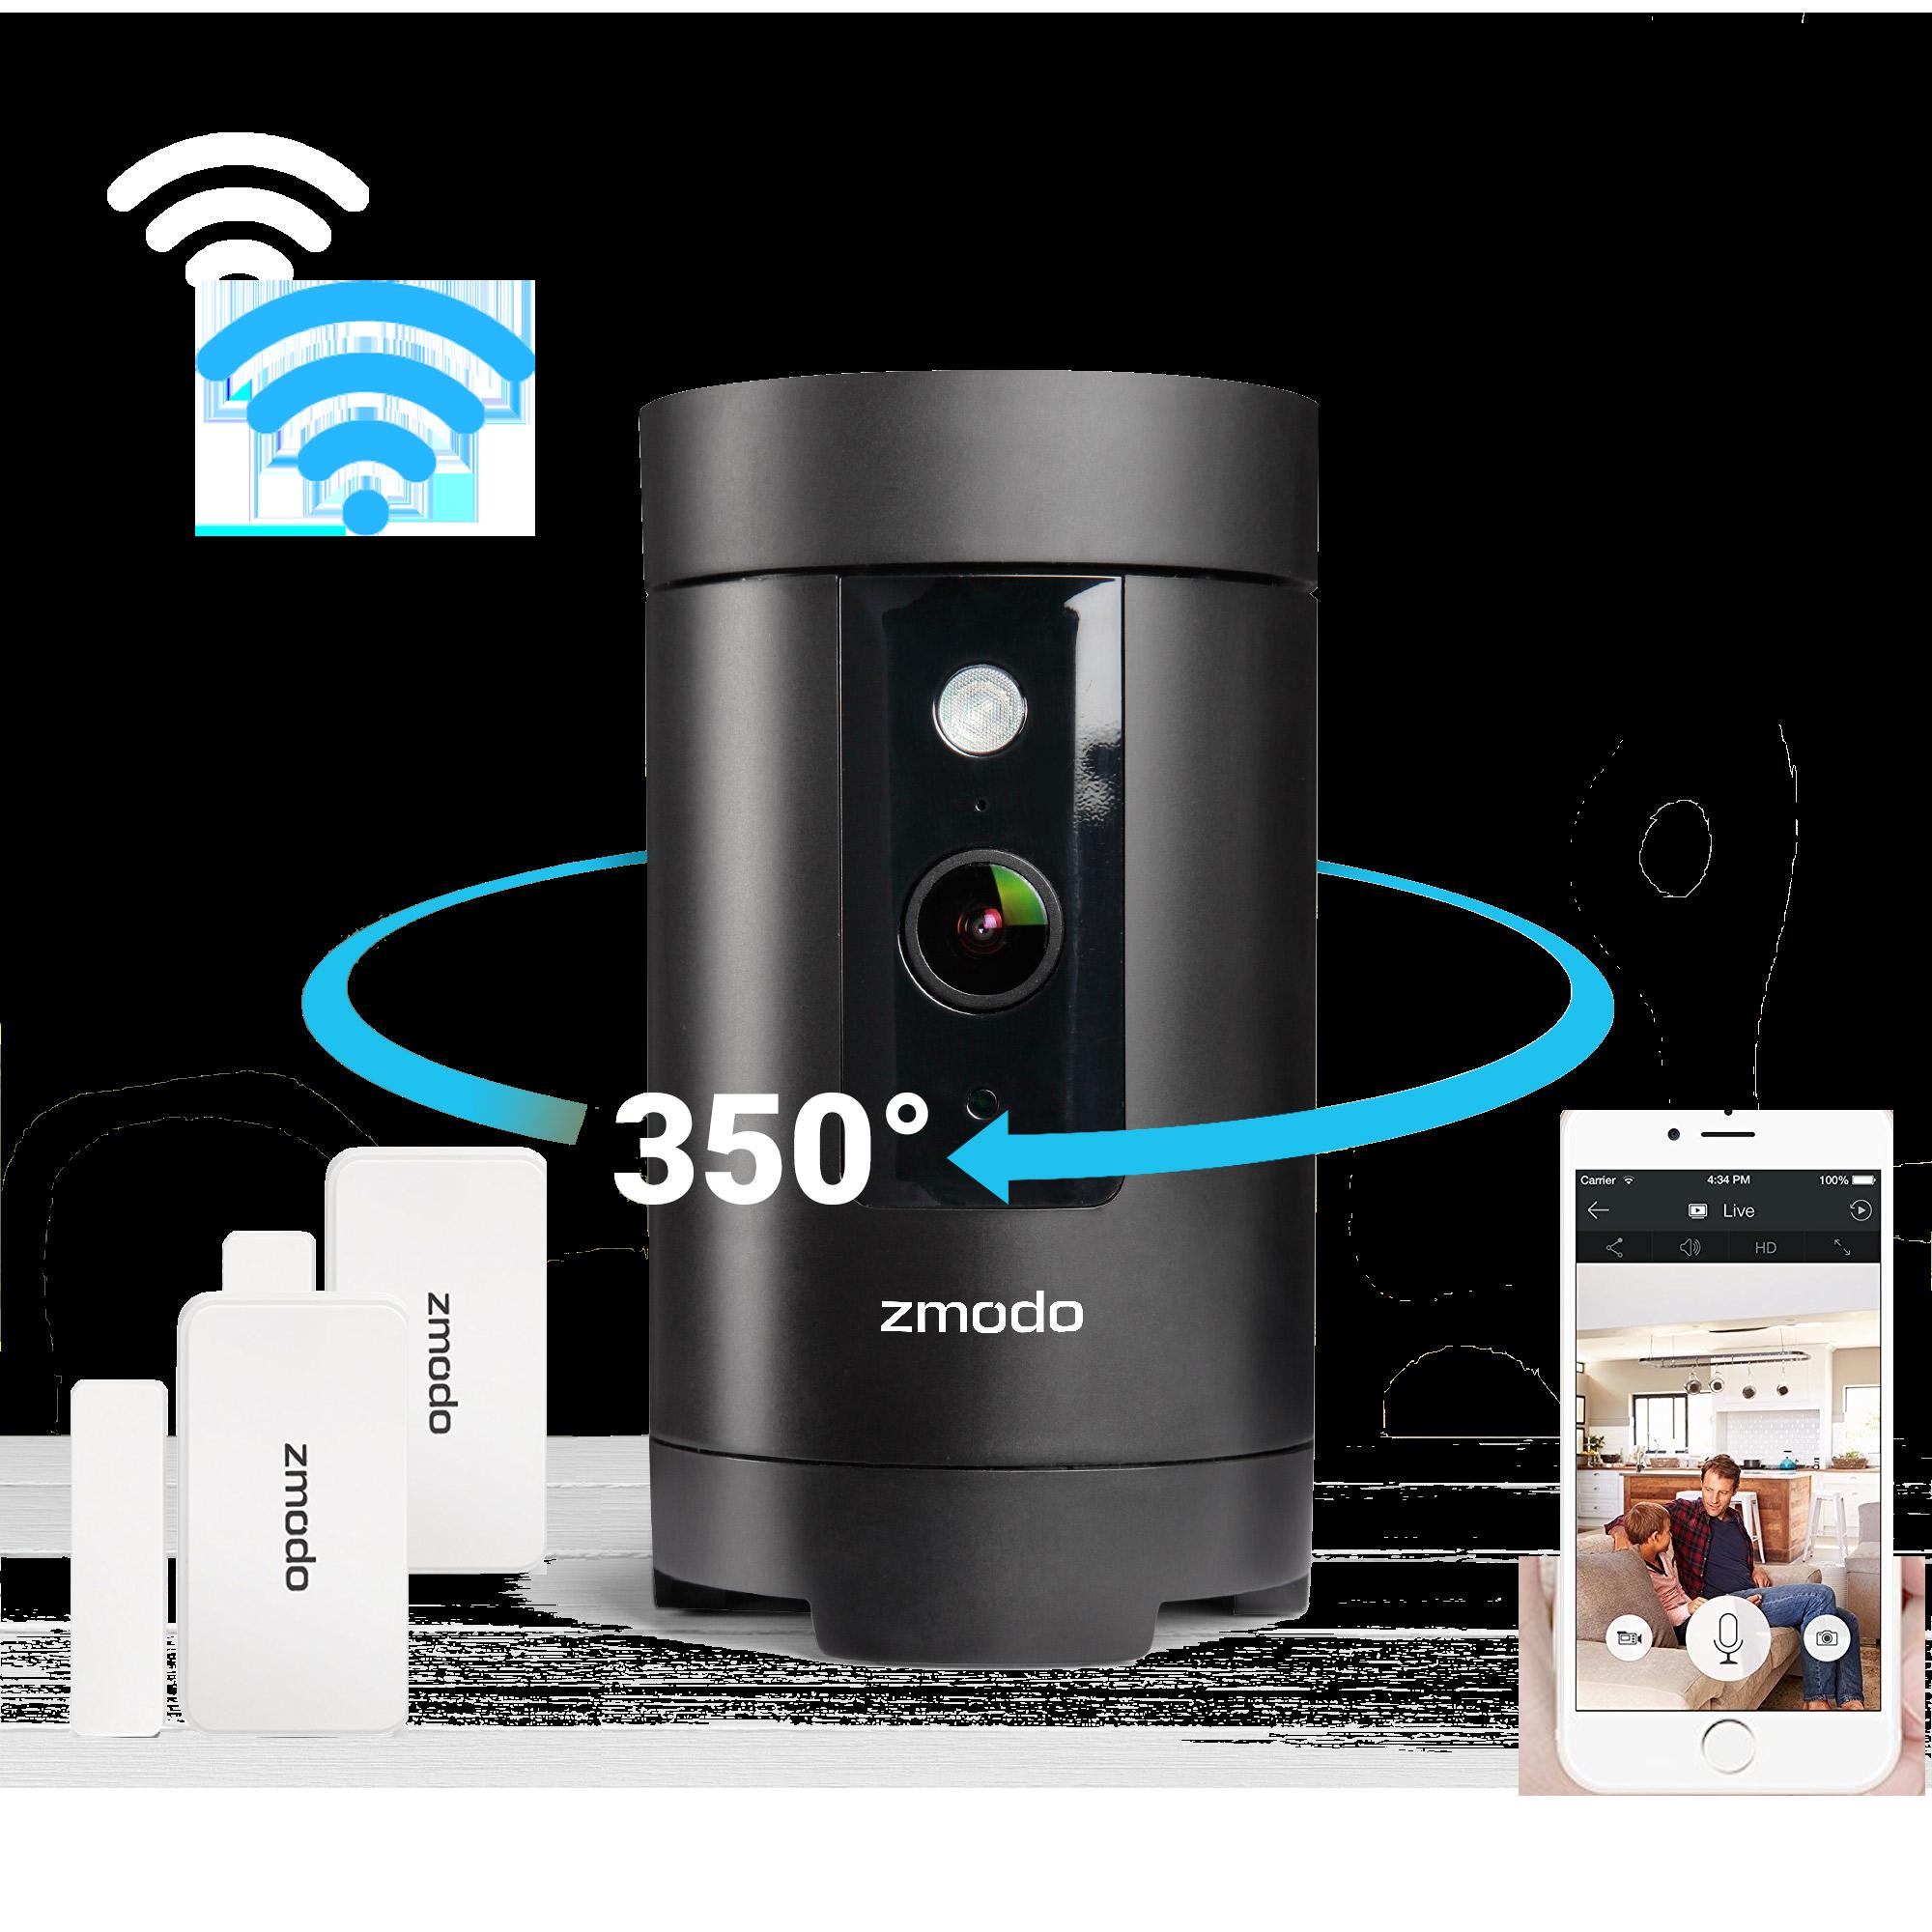 Zmodo Pivot 1080p 360° WiFi Camera with Smarthub and Window